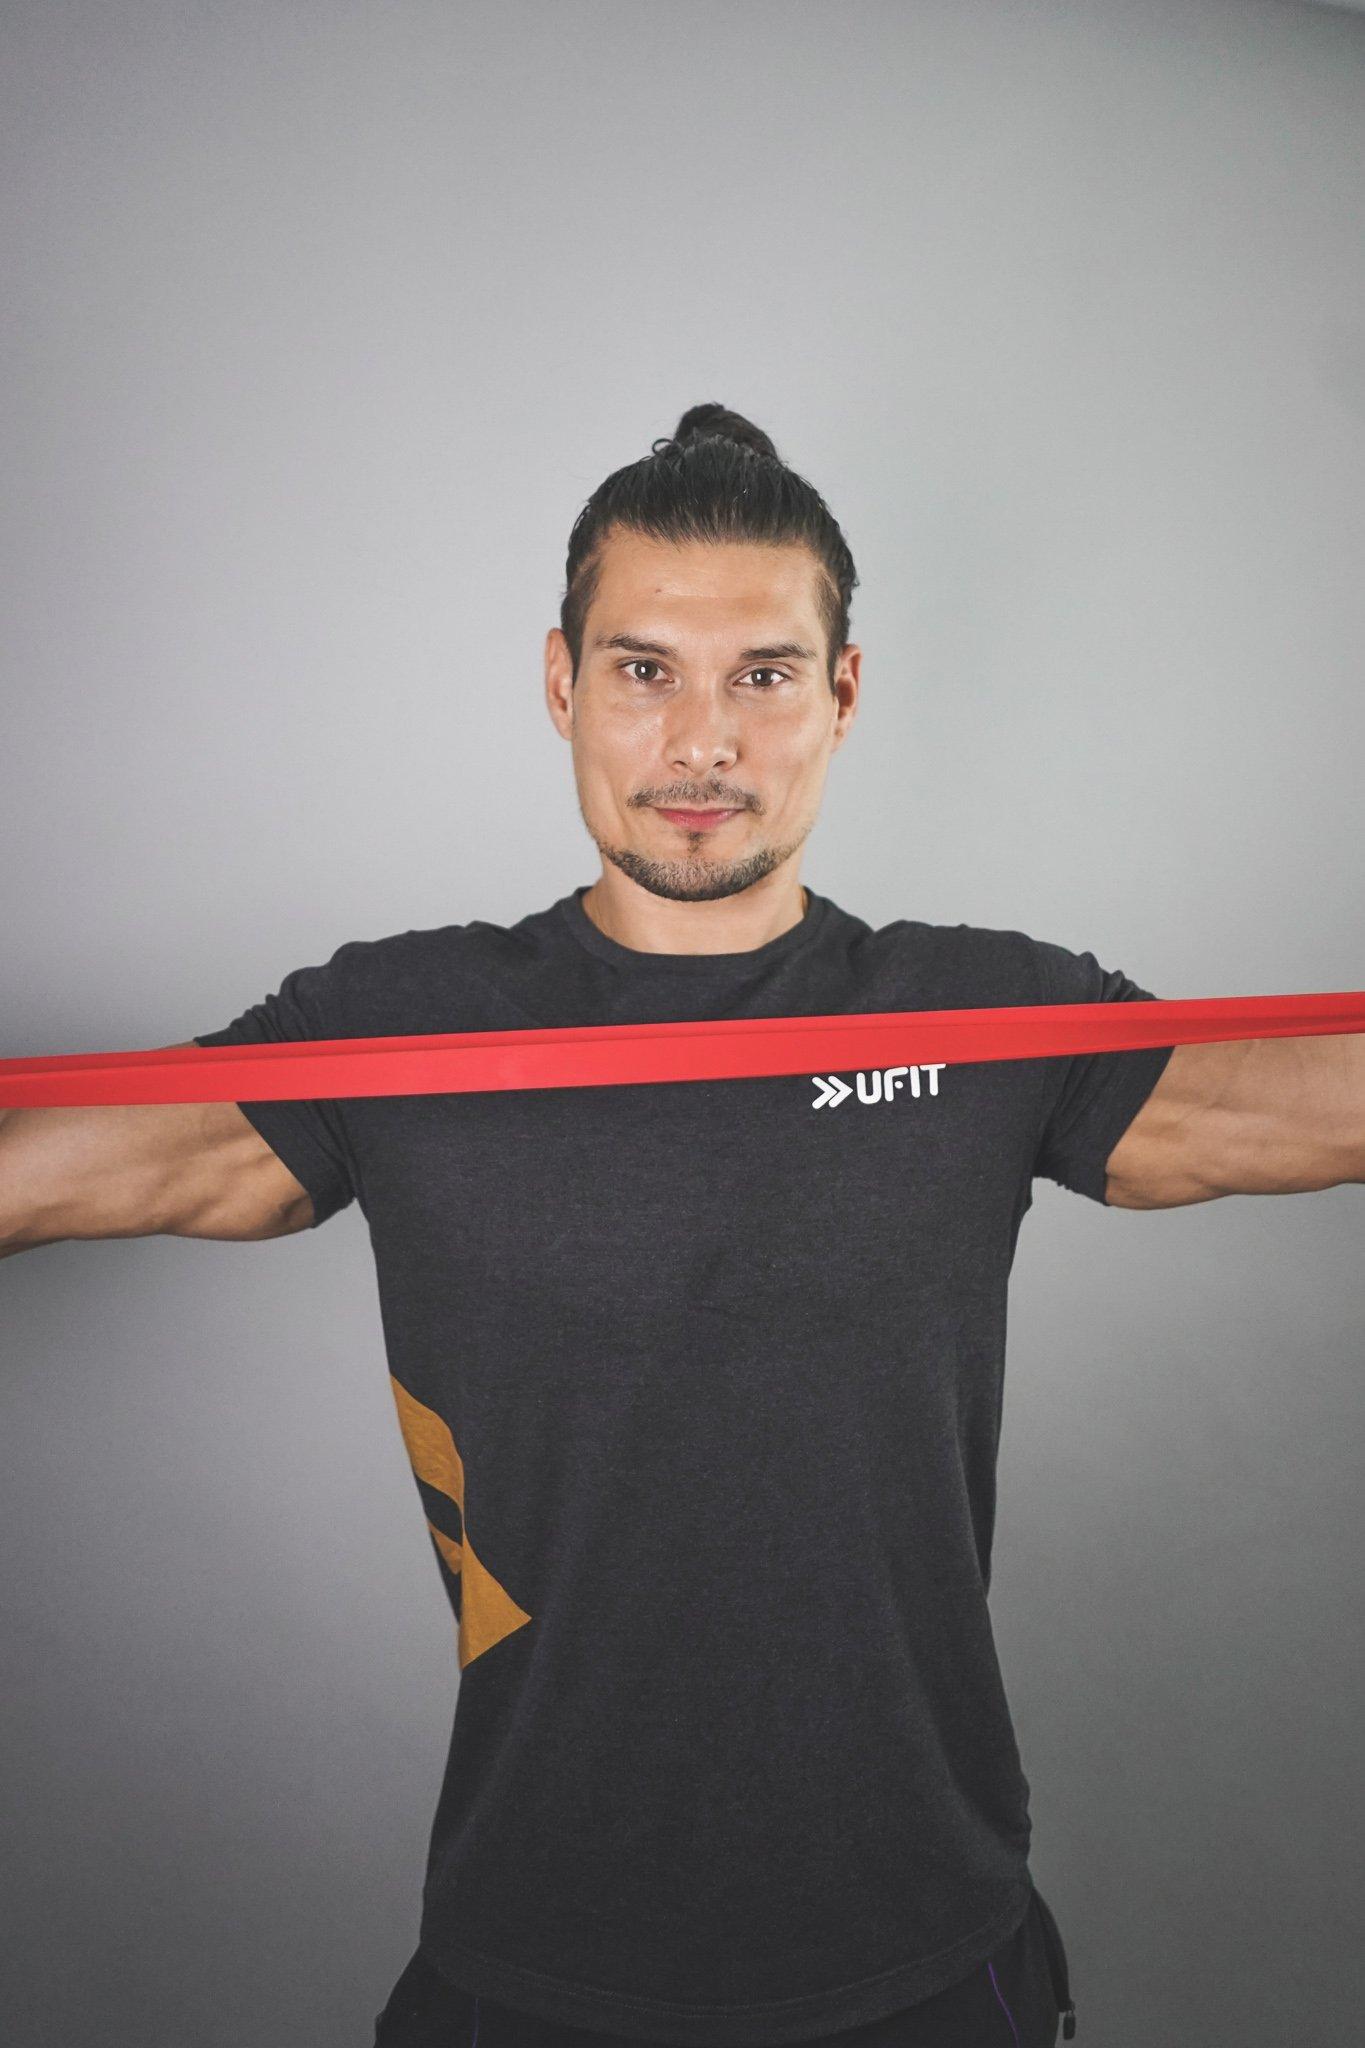 Glenn UFIT Personal Trainer